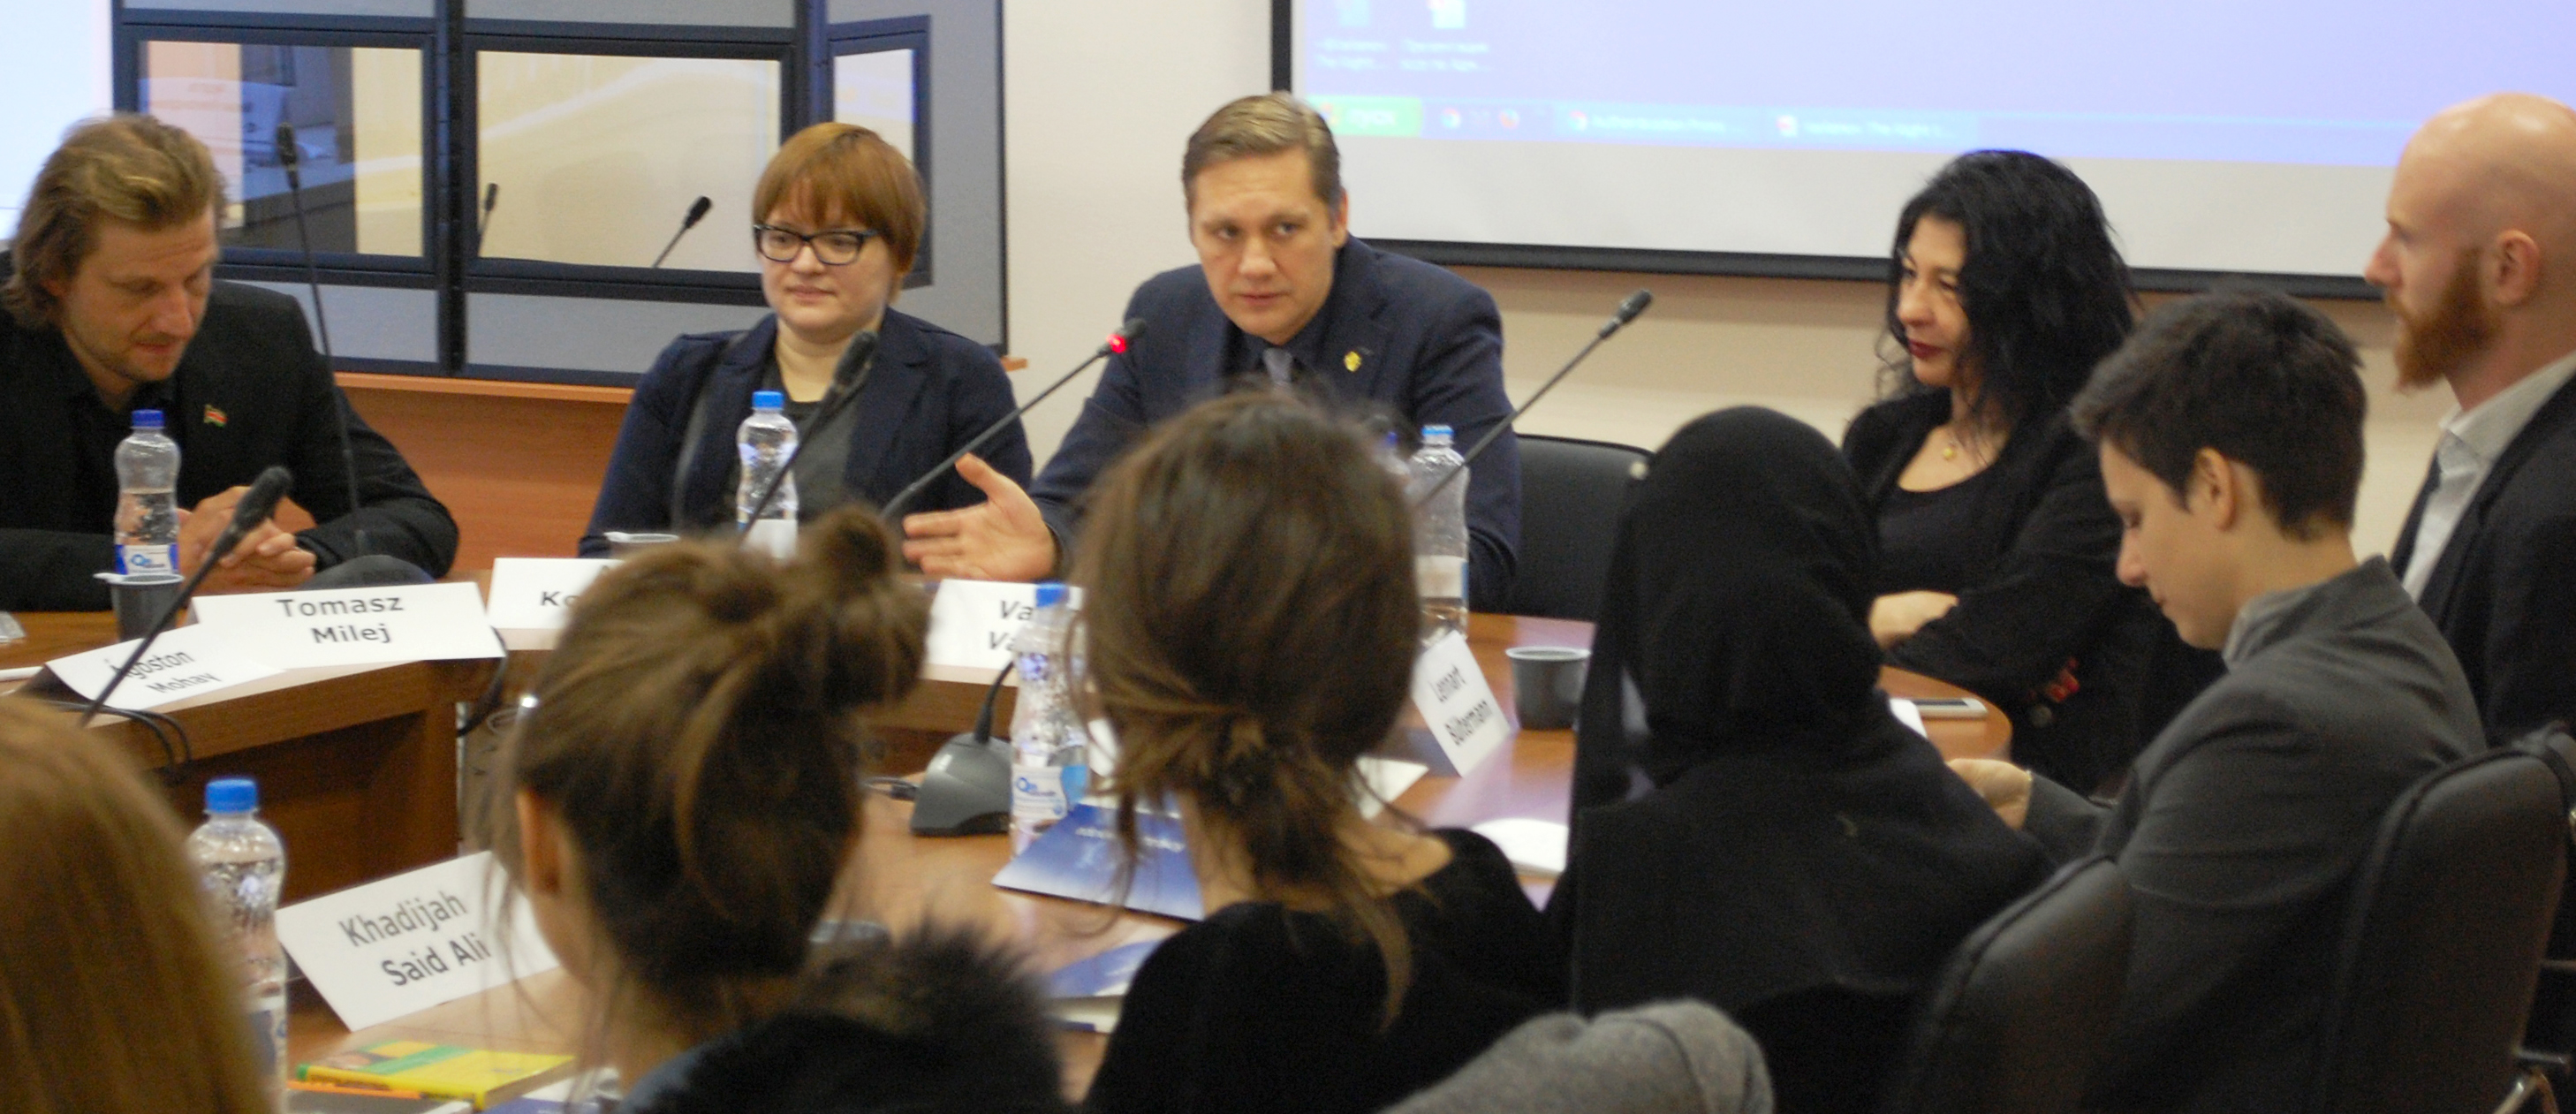 Vaidotas Vaičaitis participates in a Constitutional Law Seminar in Moscow, Russia, 2016.